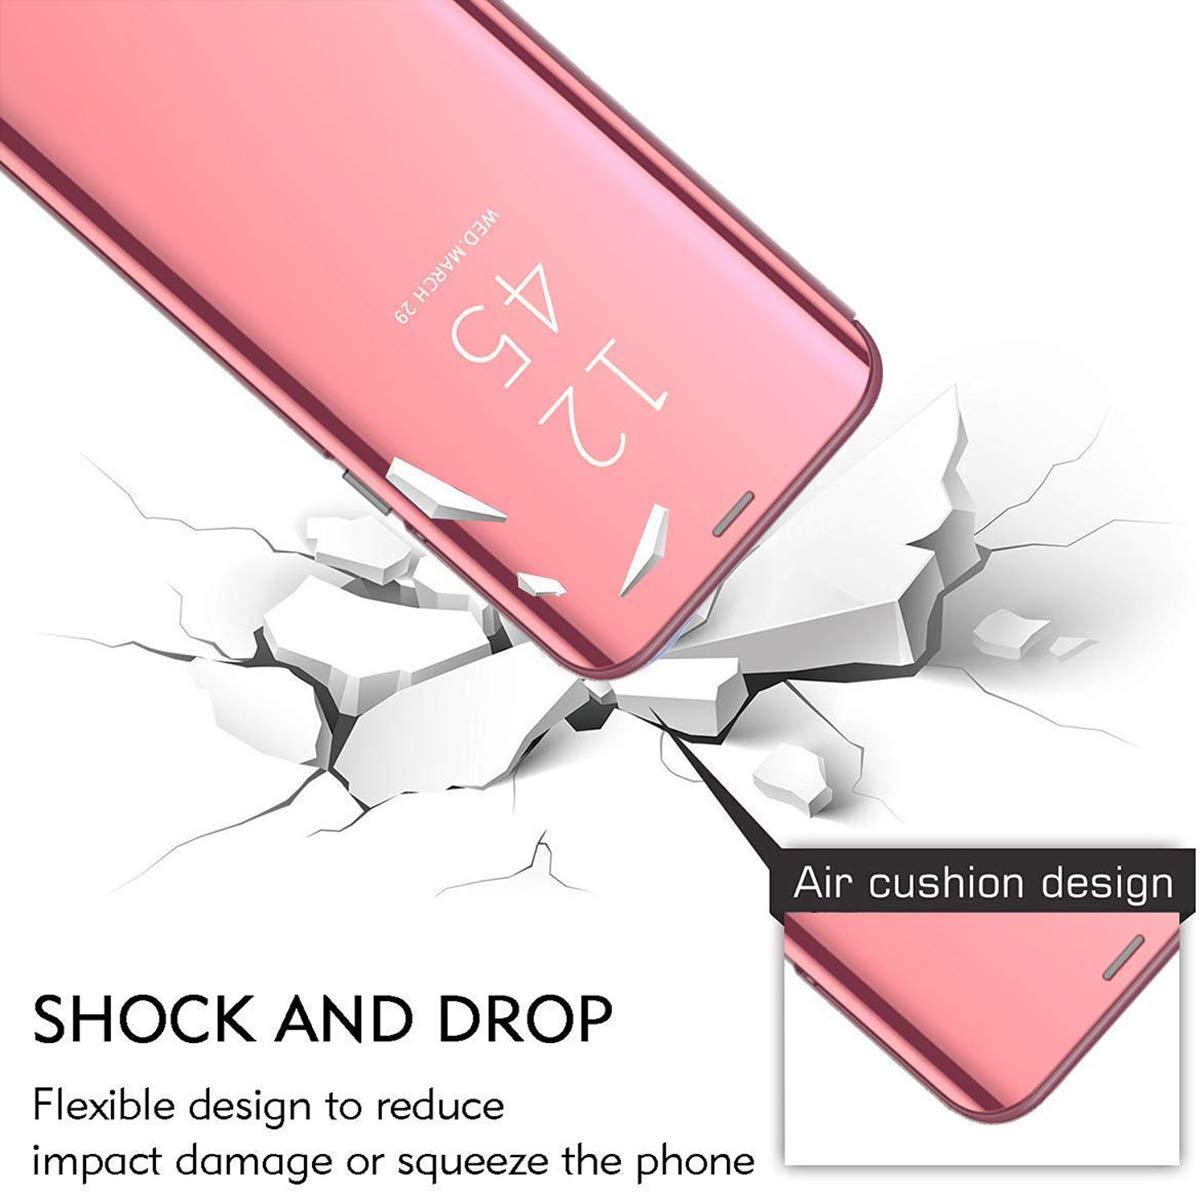 MAYO para iPhone 11 Pro MAX Funda,Espejo Ultra Slim Ligero Flip Funda Clear View Standing Cover Mirror Funda Inteligente Anti-Scratch Protector Cover para iPhone 11 Pro MAX-P/úrpura